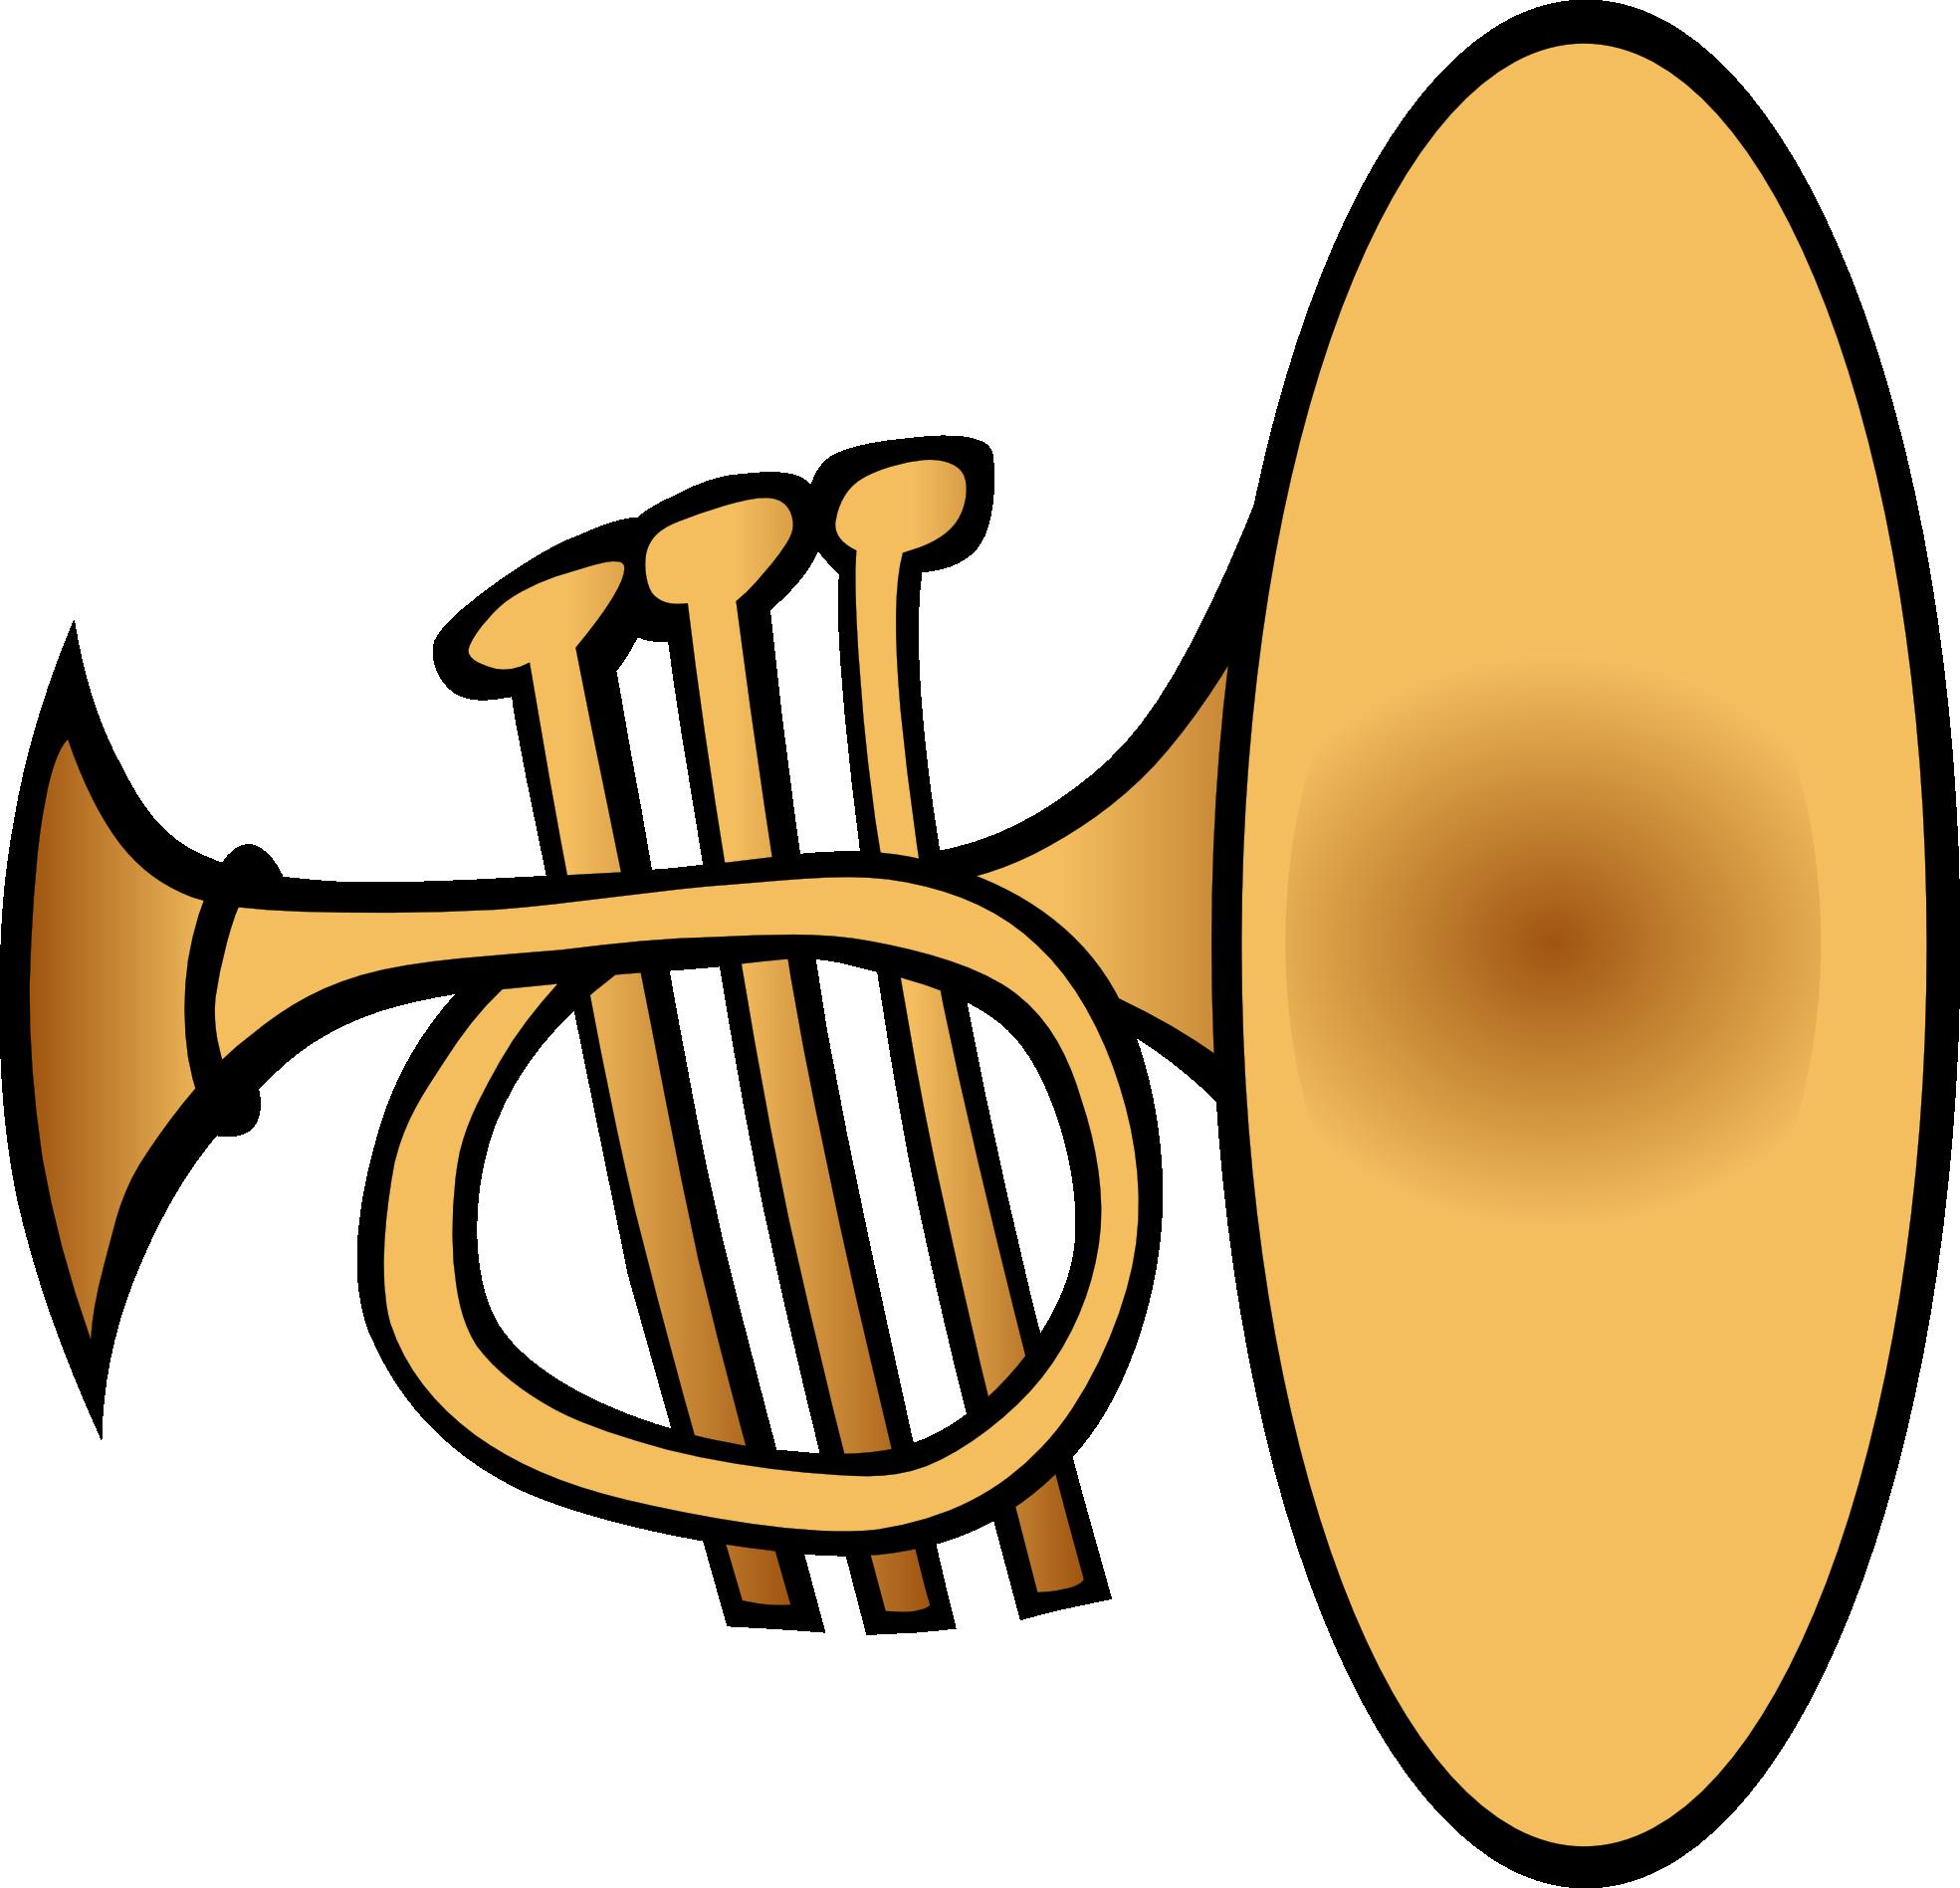 Trumpet 20clipart | Clipart Panda - Free Clipart Images